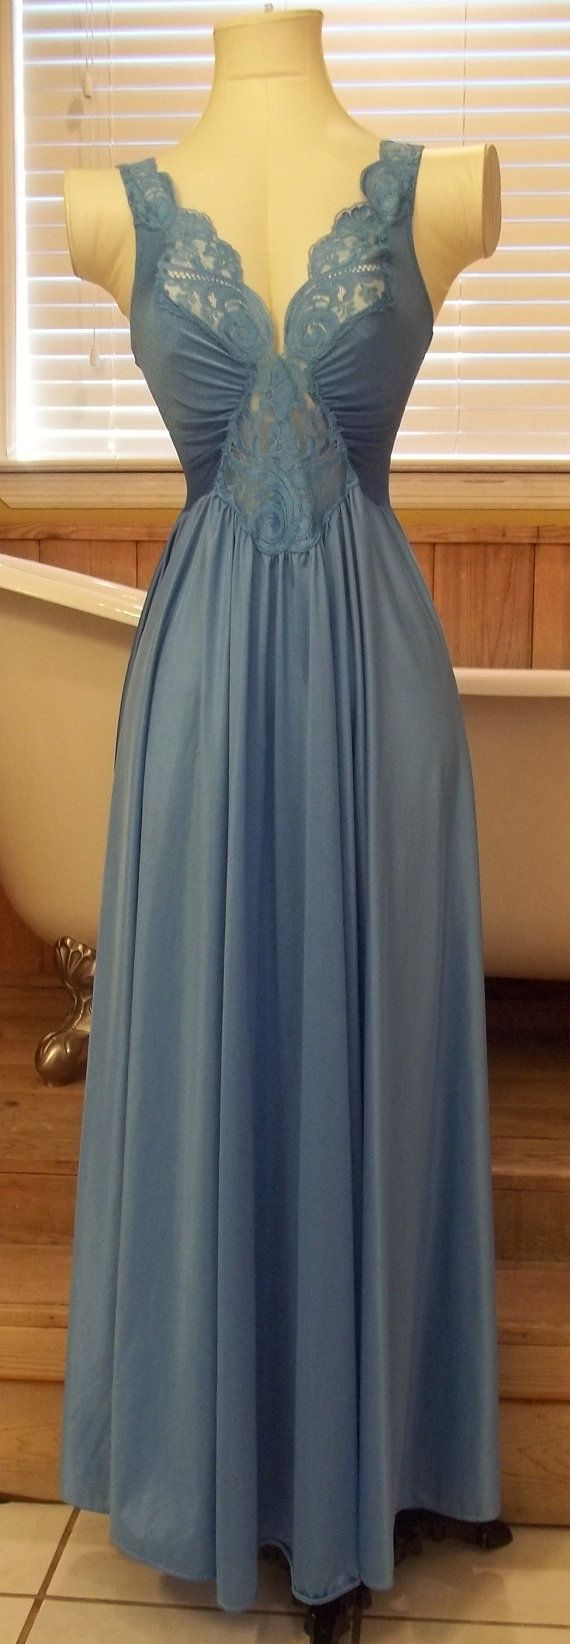 Vintage Olga Nightgown Spandex Bodice 150 by LaneysThisandThat,